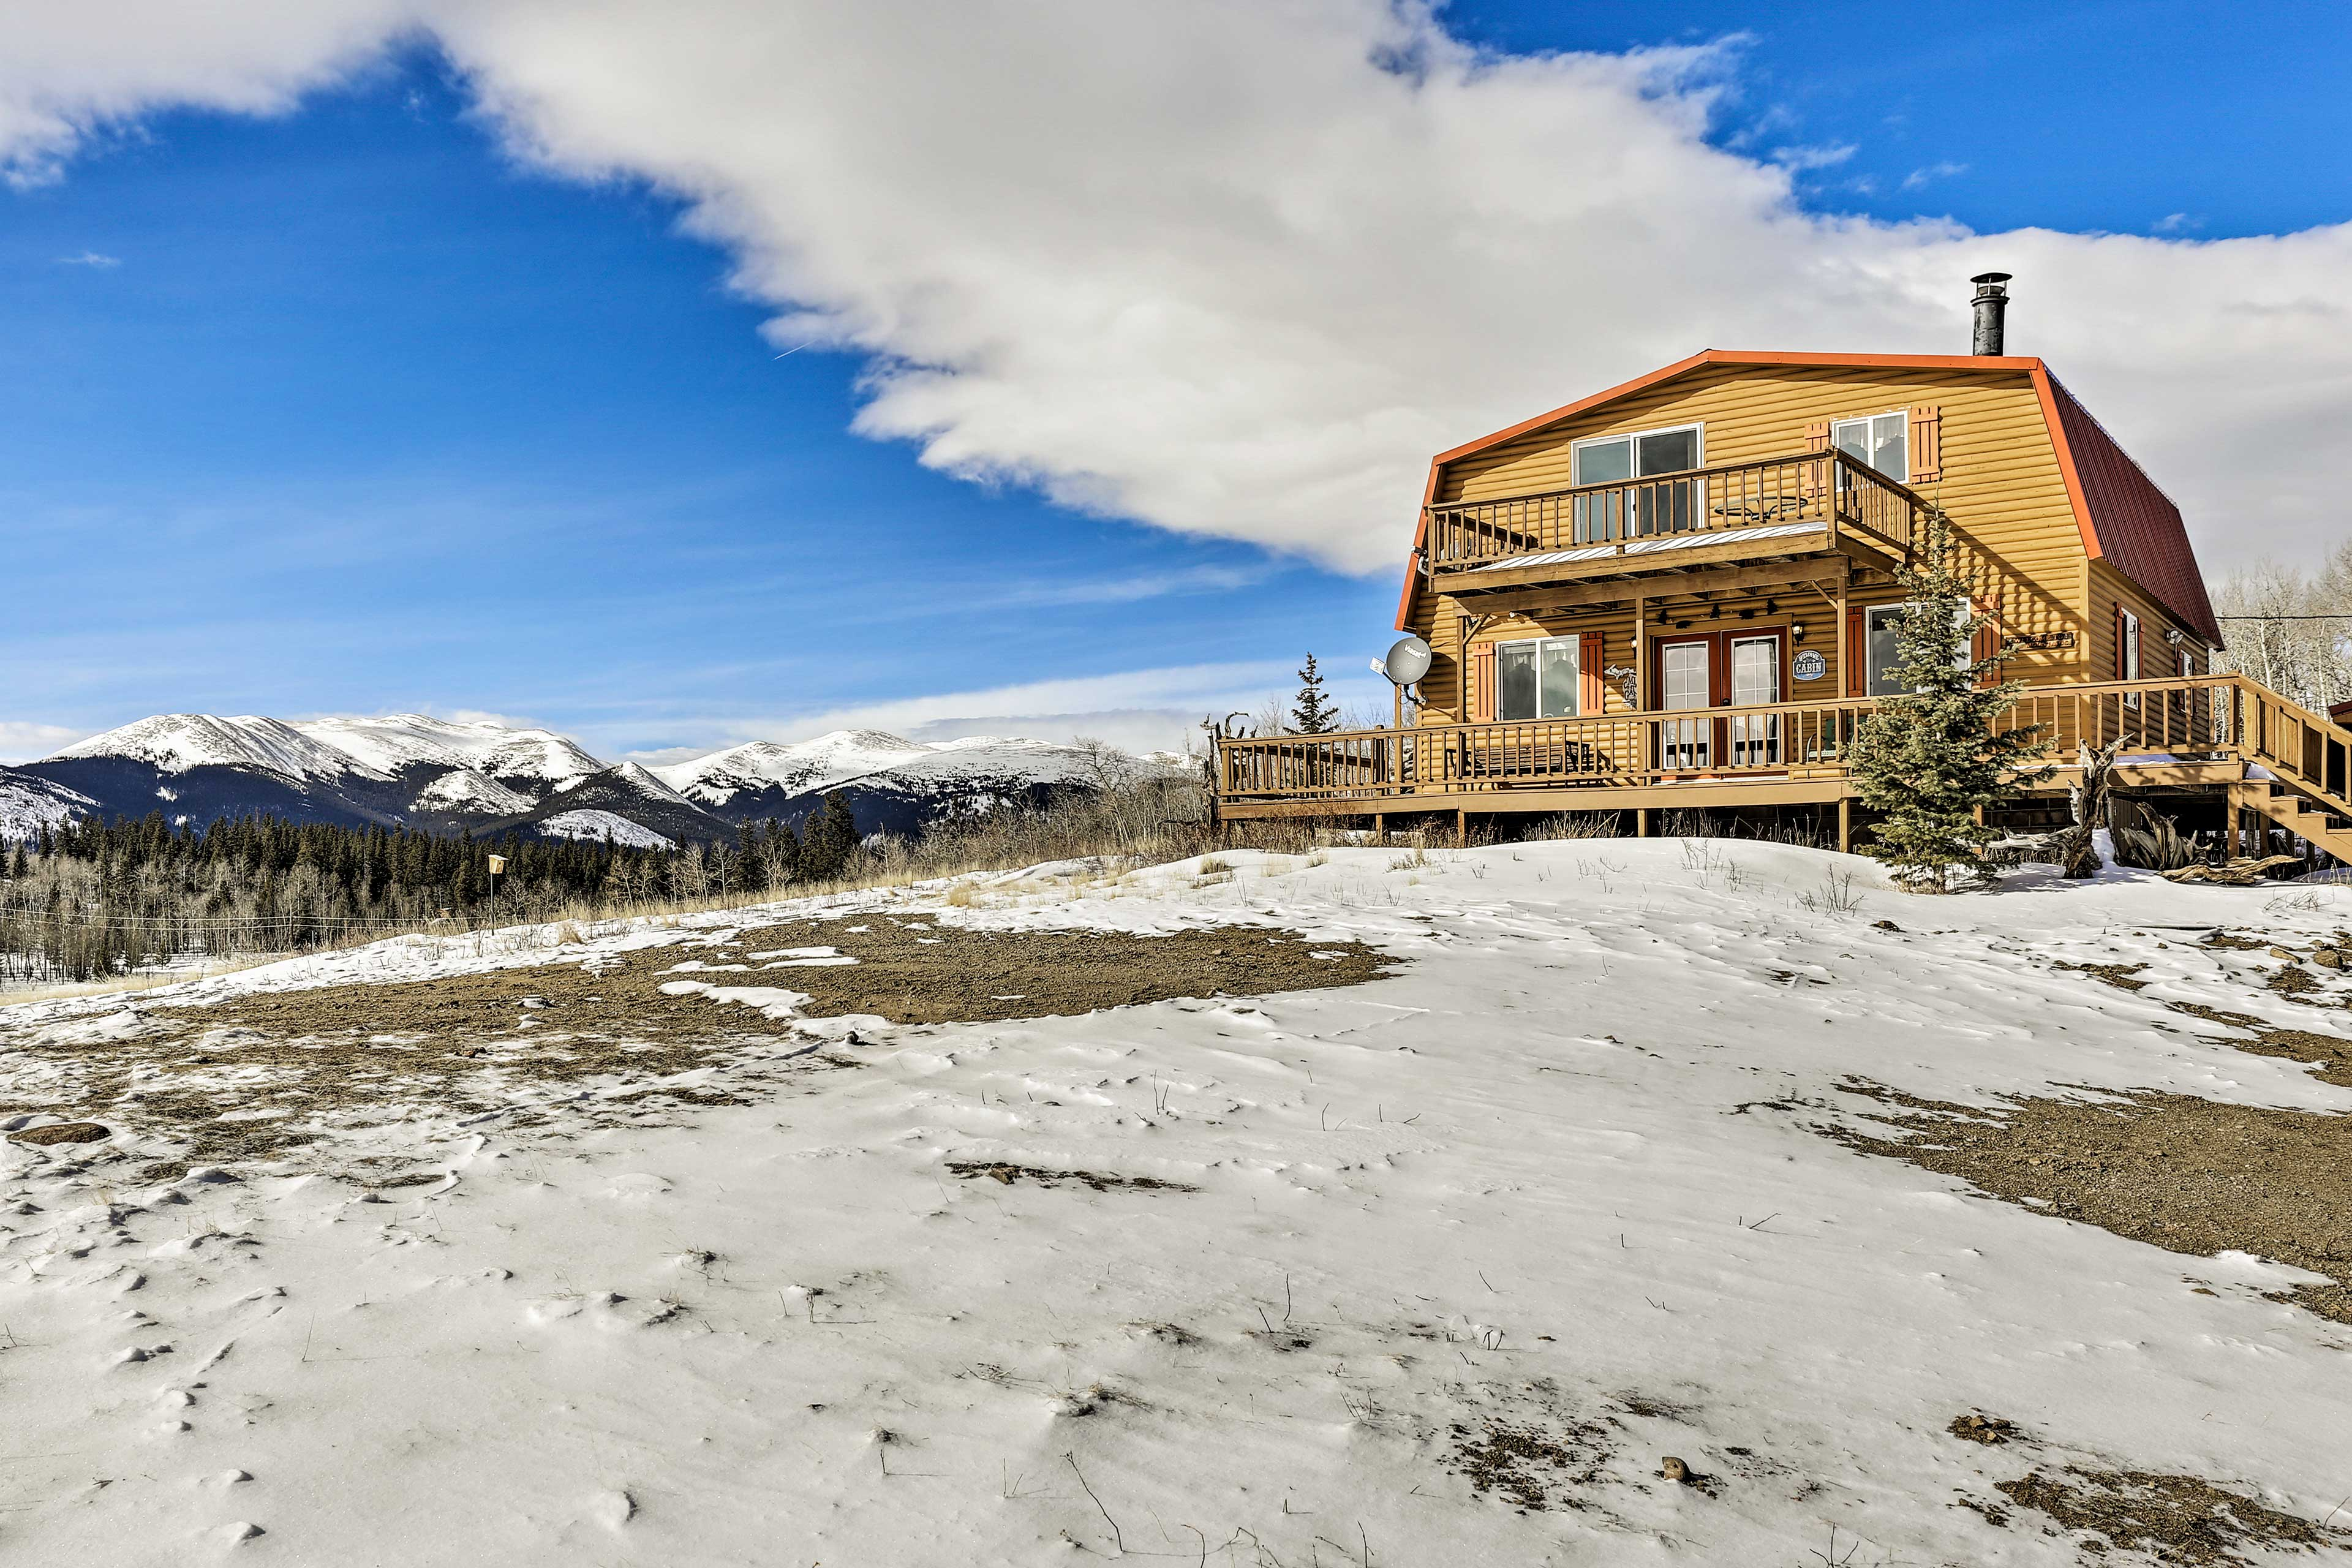 This vacation rental cabin has beautiful mountain views.